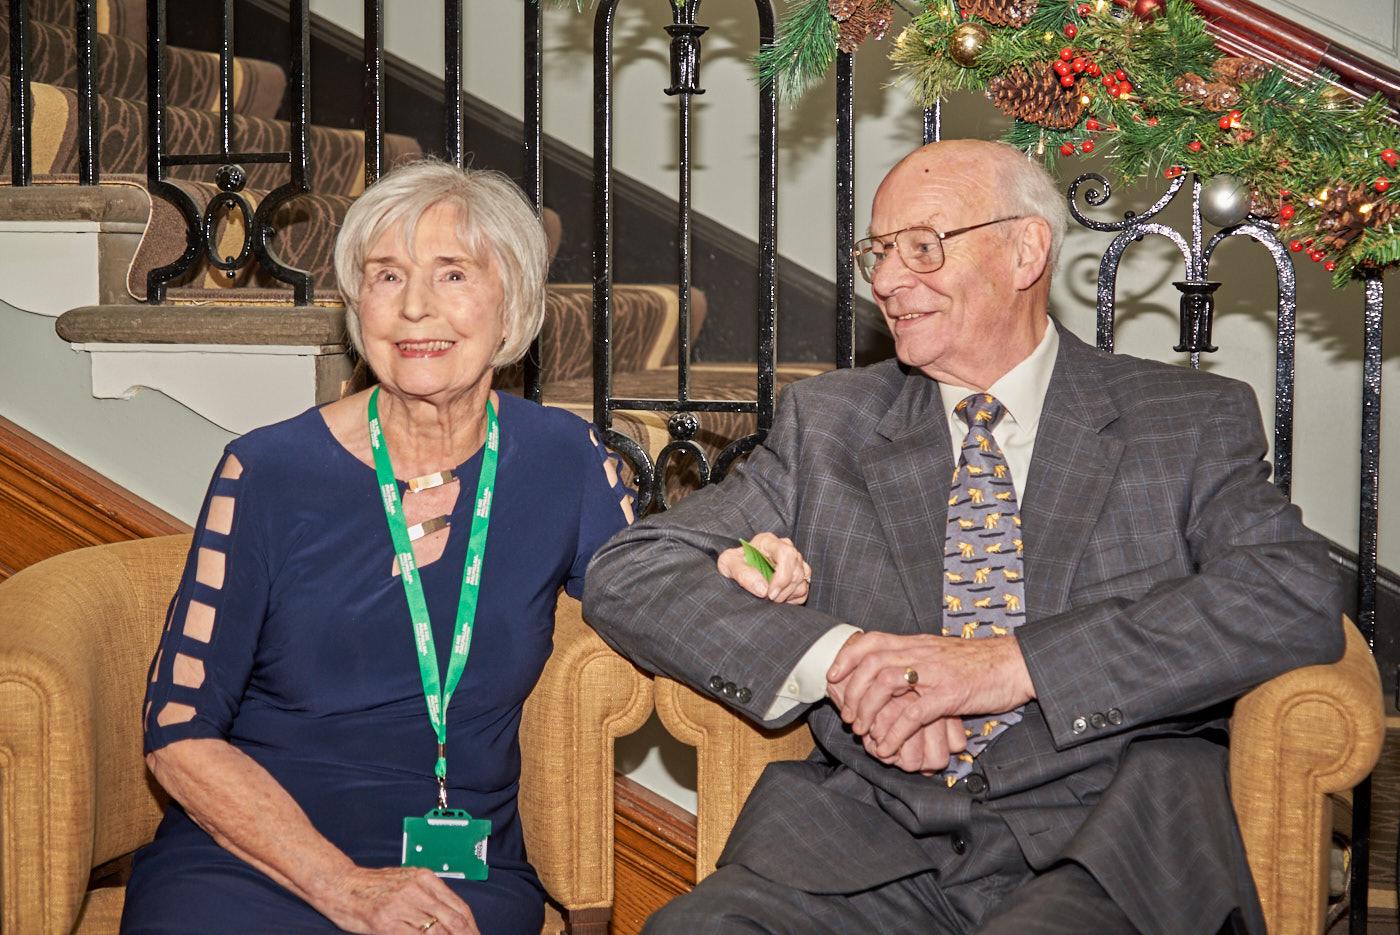 Macmillan Auchterarder & Rosenethe